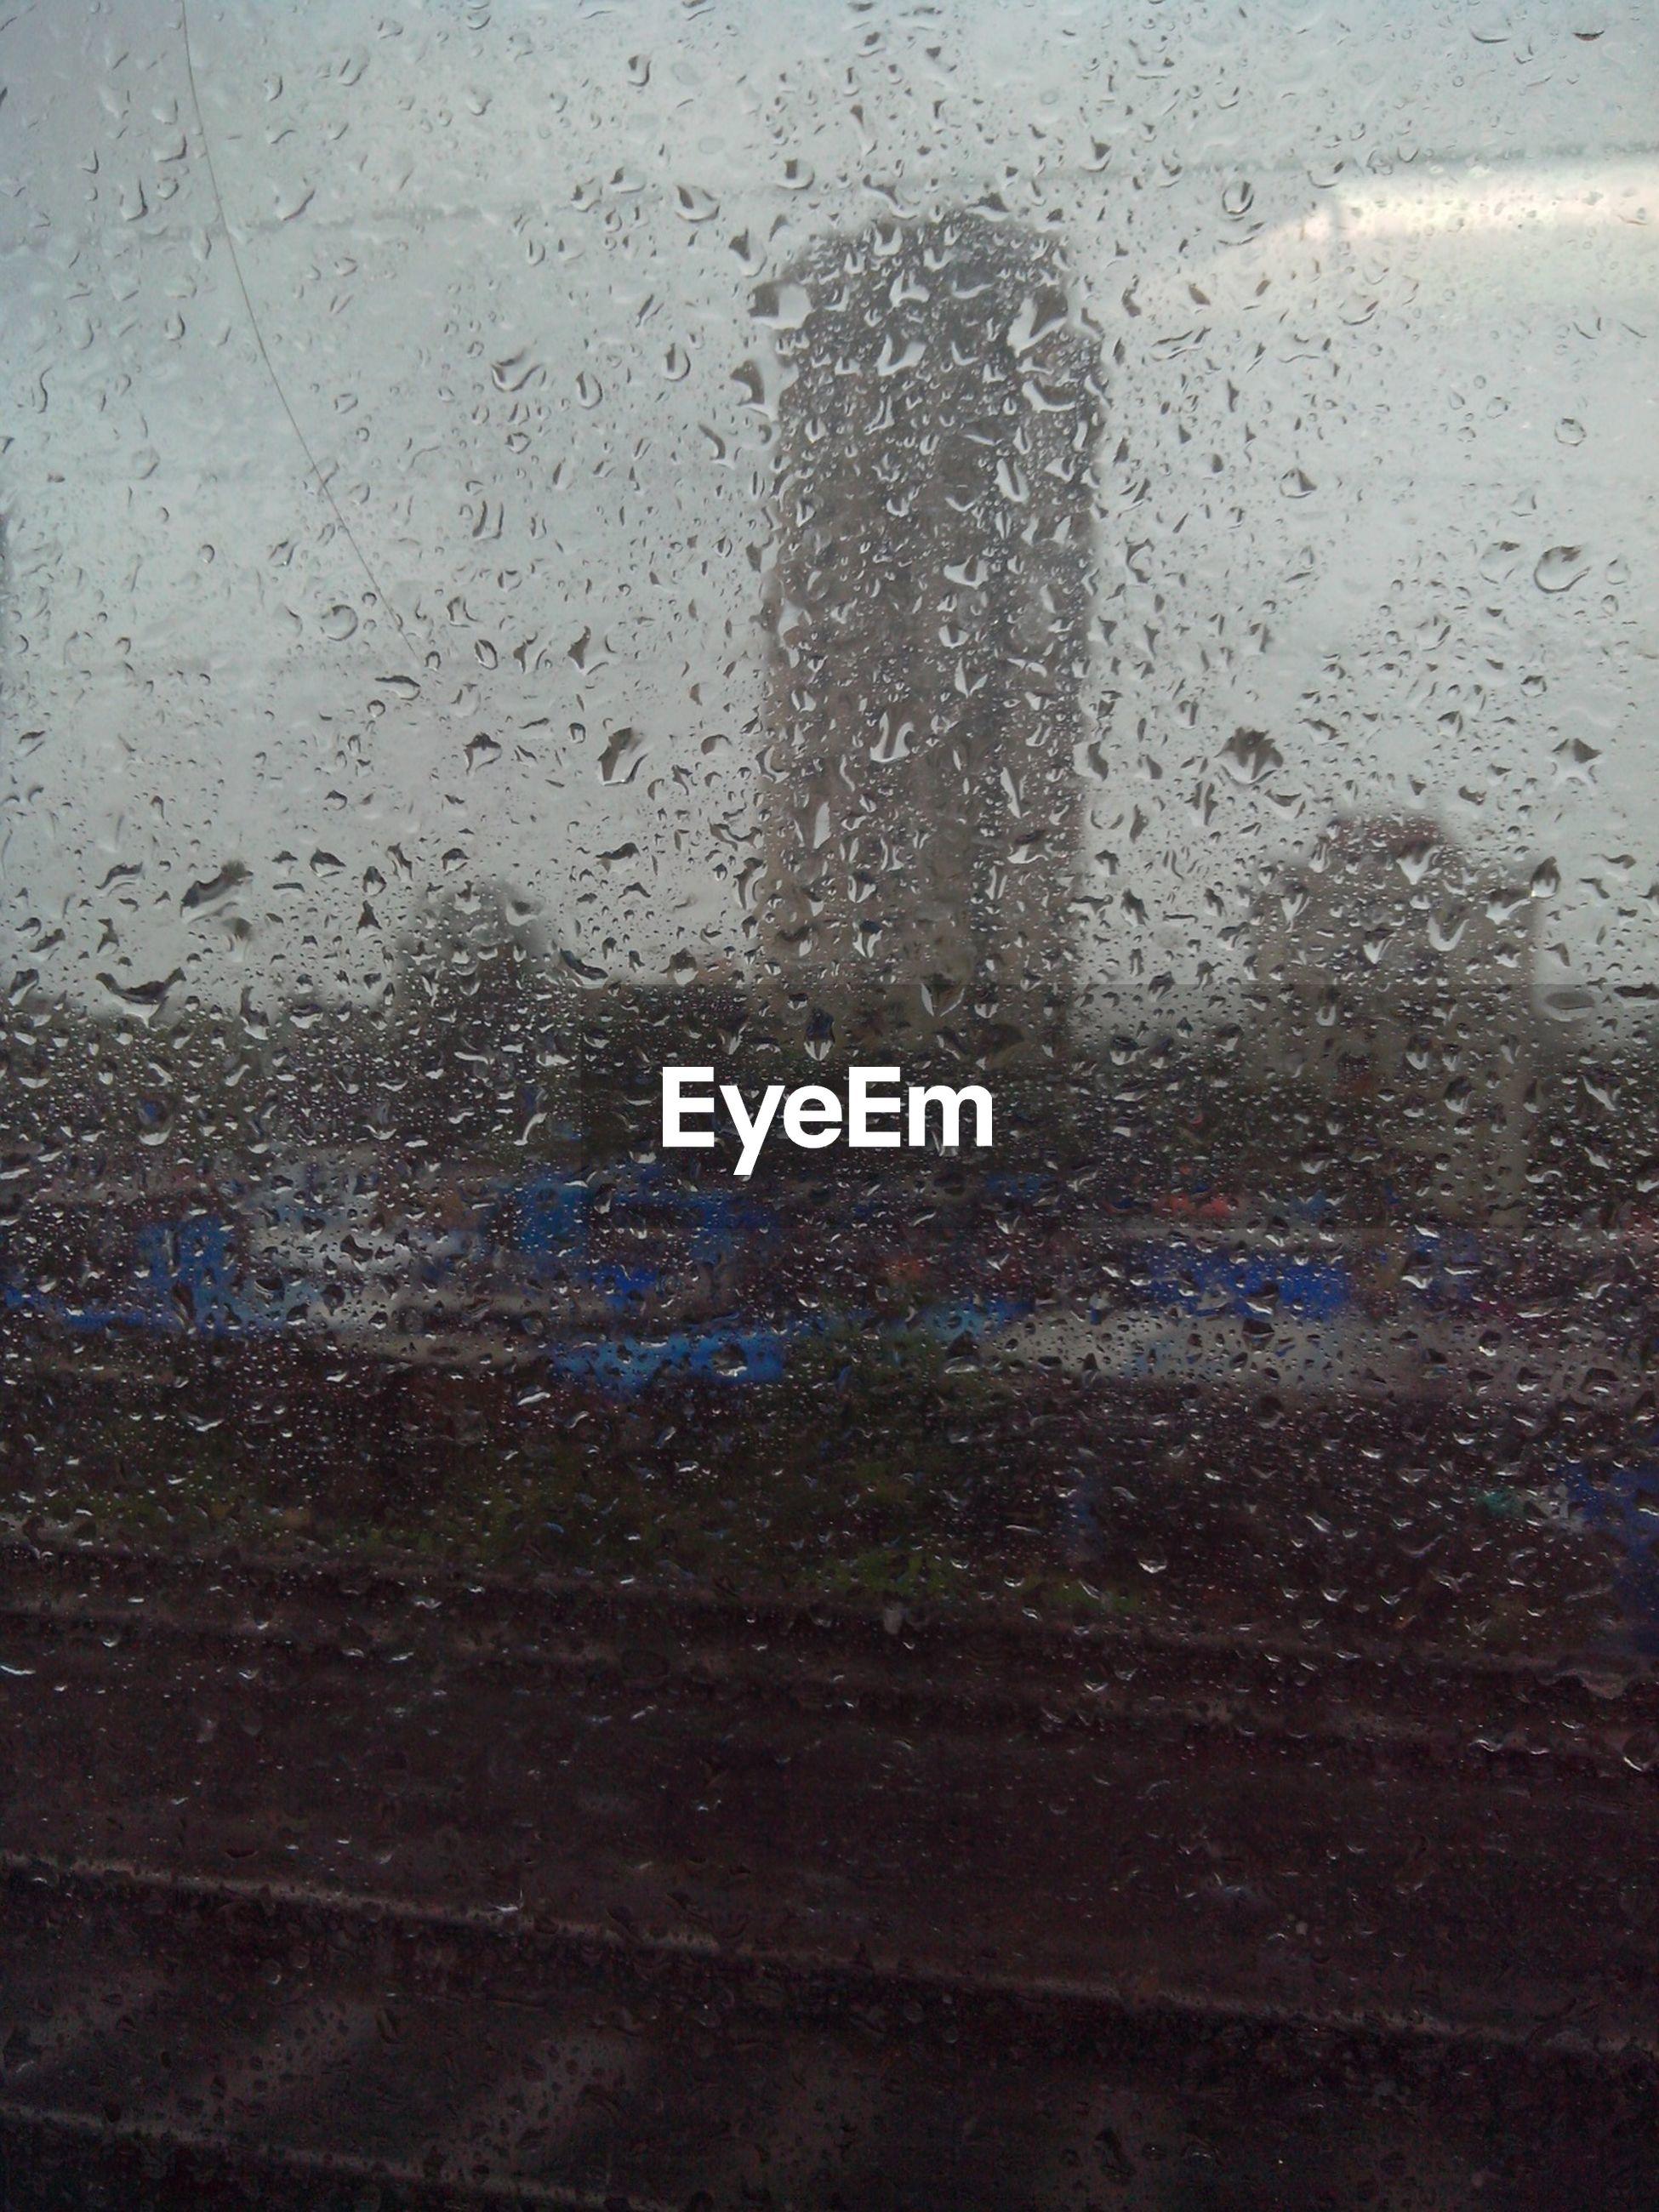 Waterdrops on glass against buildings